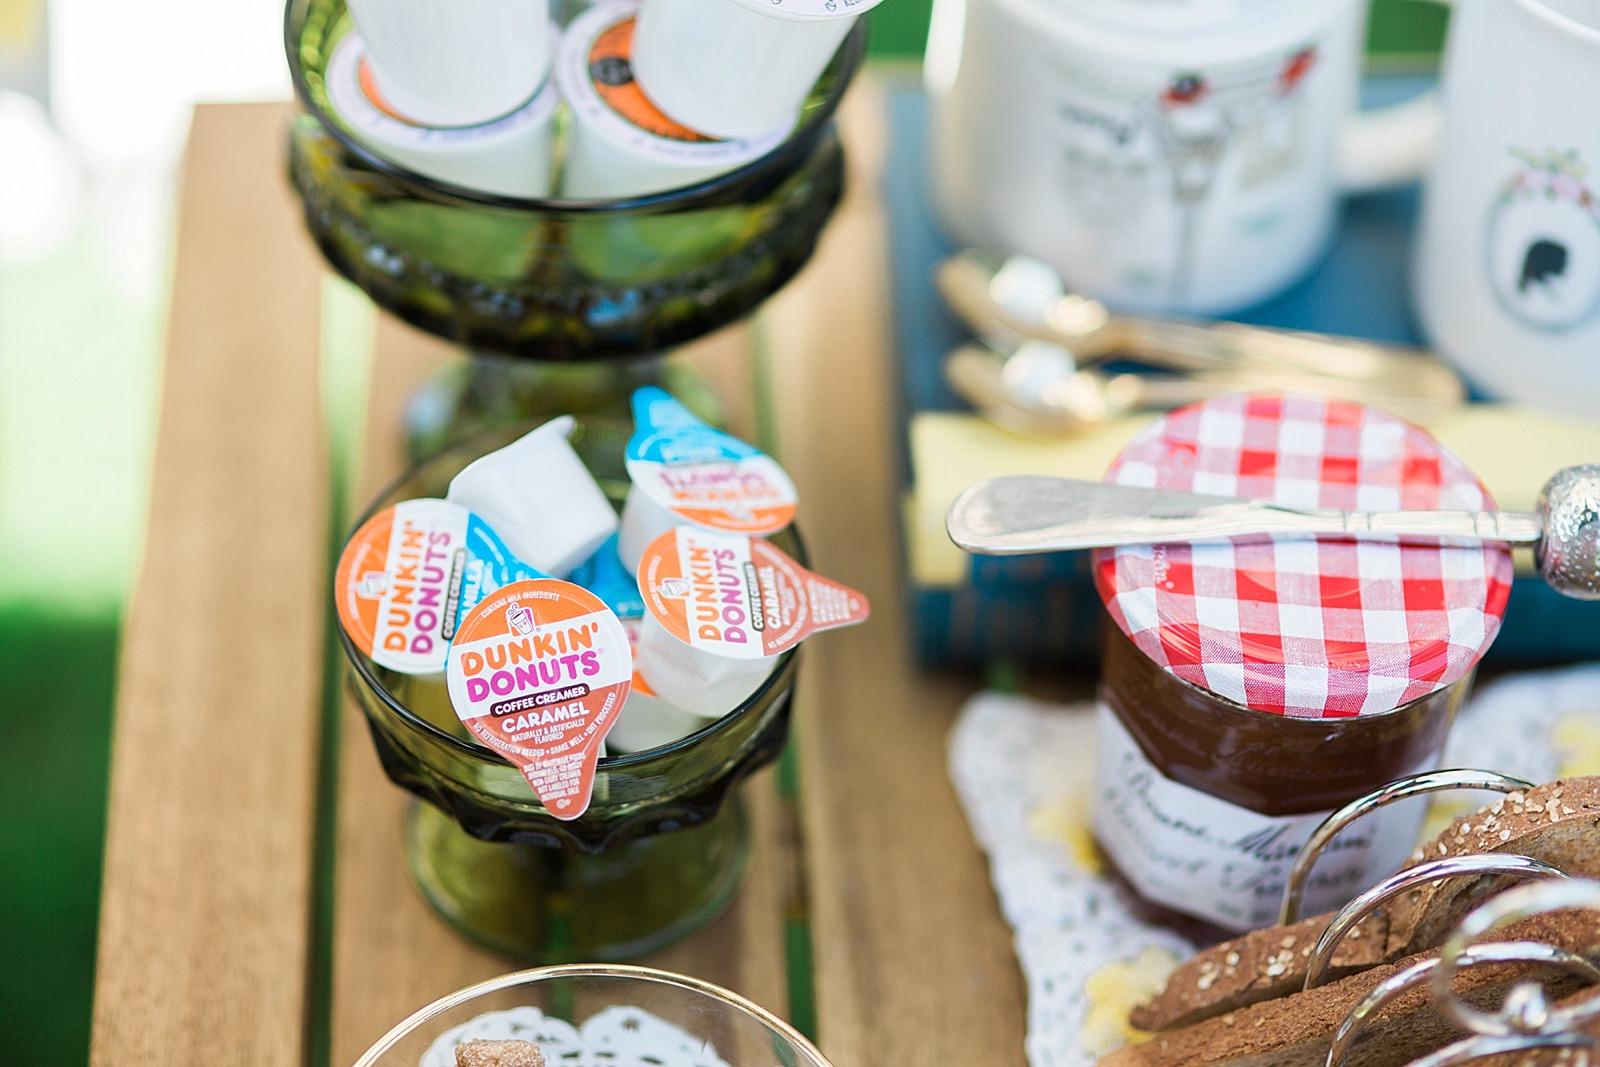 diana-elizabeth-blog-lifestyle-dunkin-creamers-dunkin-donuts-brunch-book-club--4539